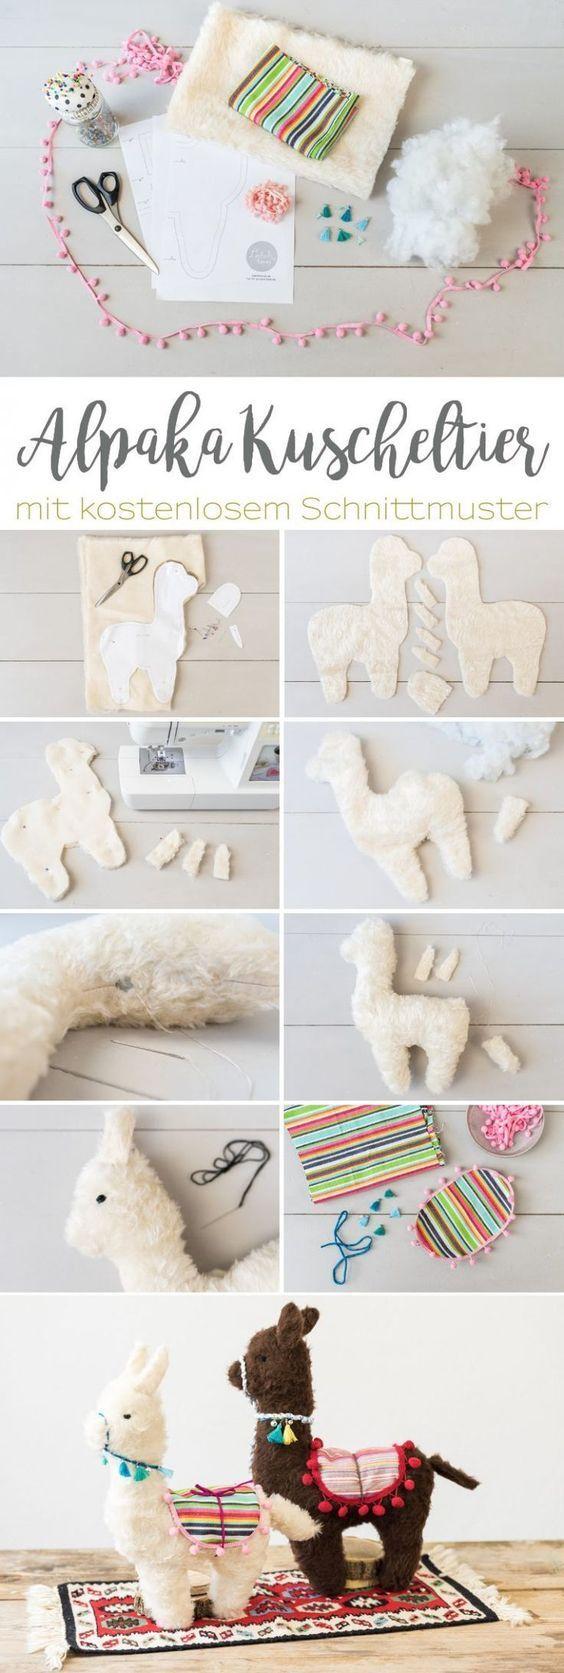 DIY - Geschenke: Alpaka Kuscheltier nähen - Leelah Loves #fieltromanualidades